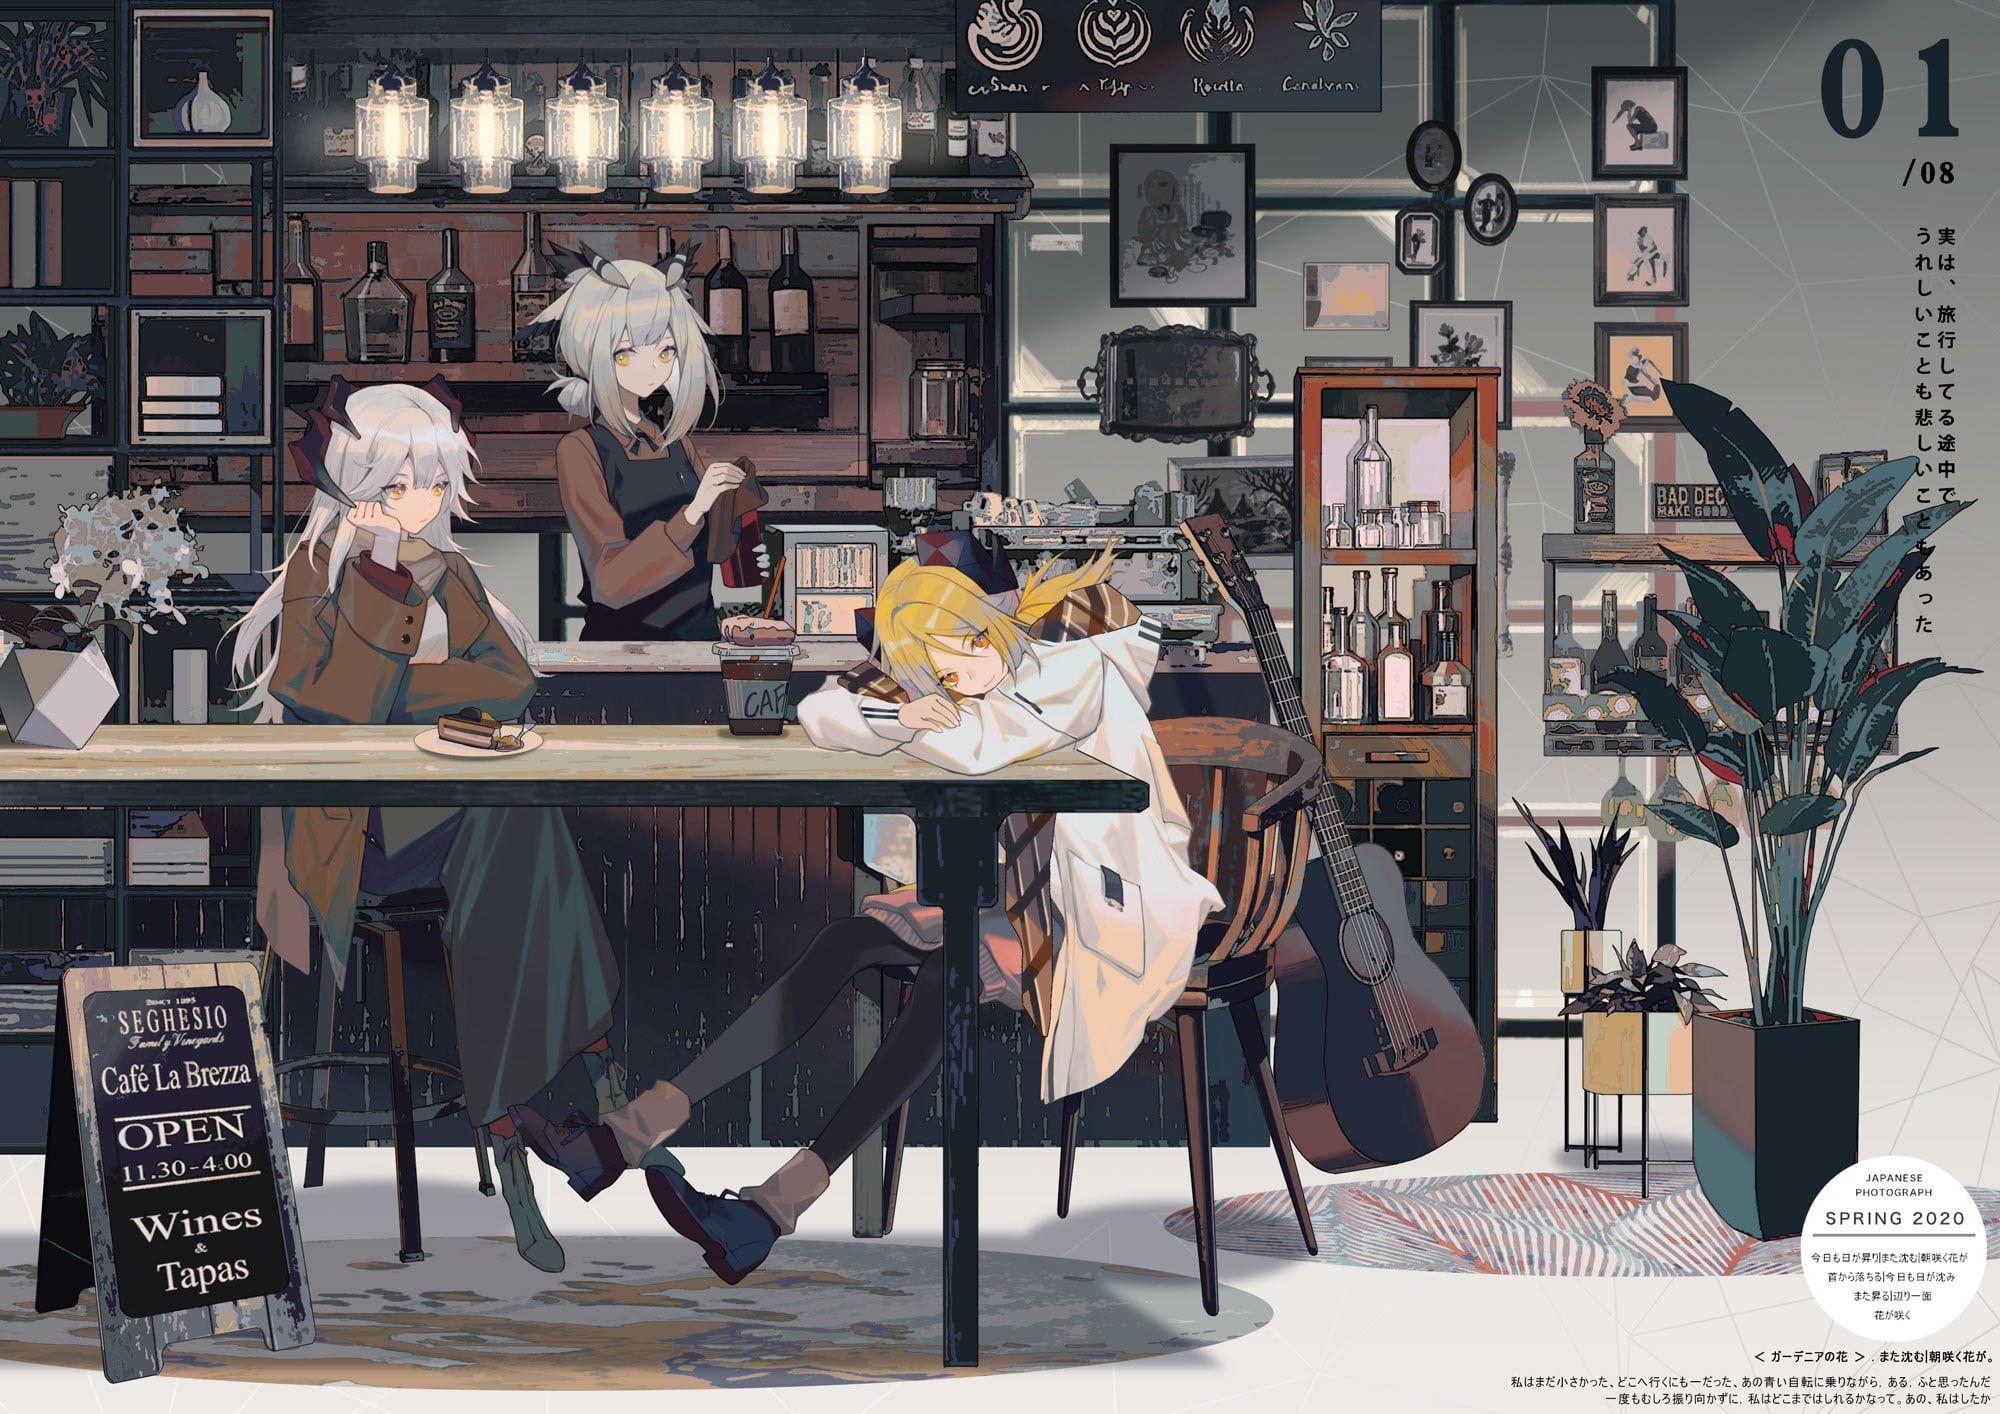 Arknights Anime Plants Cafe Coffee Donuts Cake Saria Arknights Ifrit Arknights Ptilopsis Arknights Pub Guitar 1080p Gambar Anime Animasi Gambar